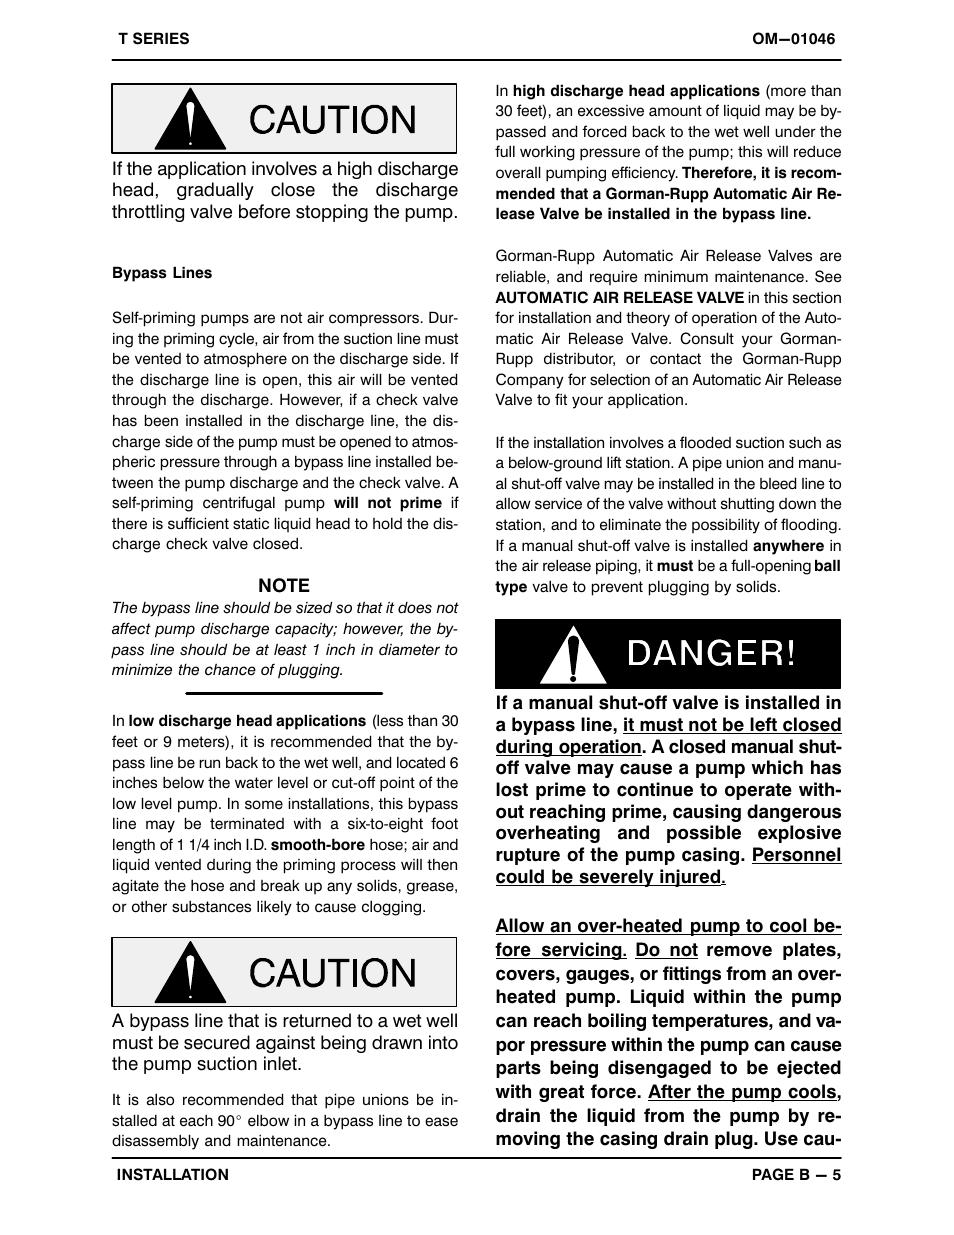 gorman rupp pumps t6a3 b f fm user manual page 12 39 rh manualsdir com gorman rupp ghs series manual gorman rupp t series manual